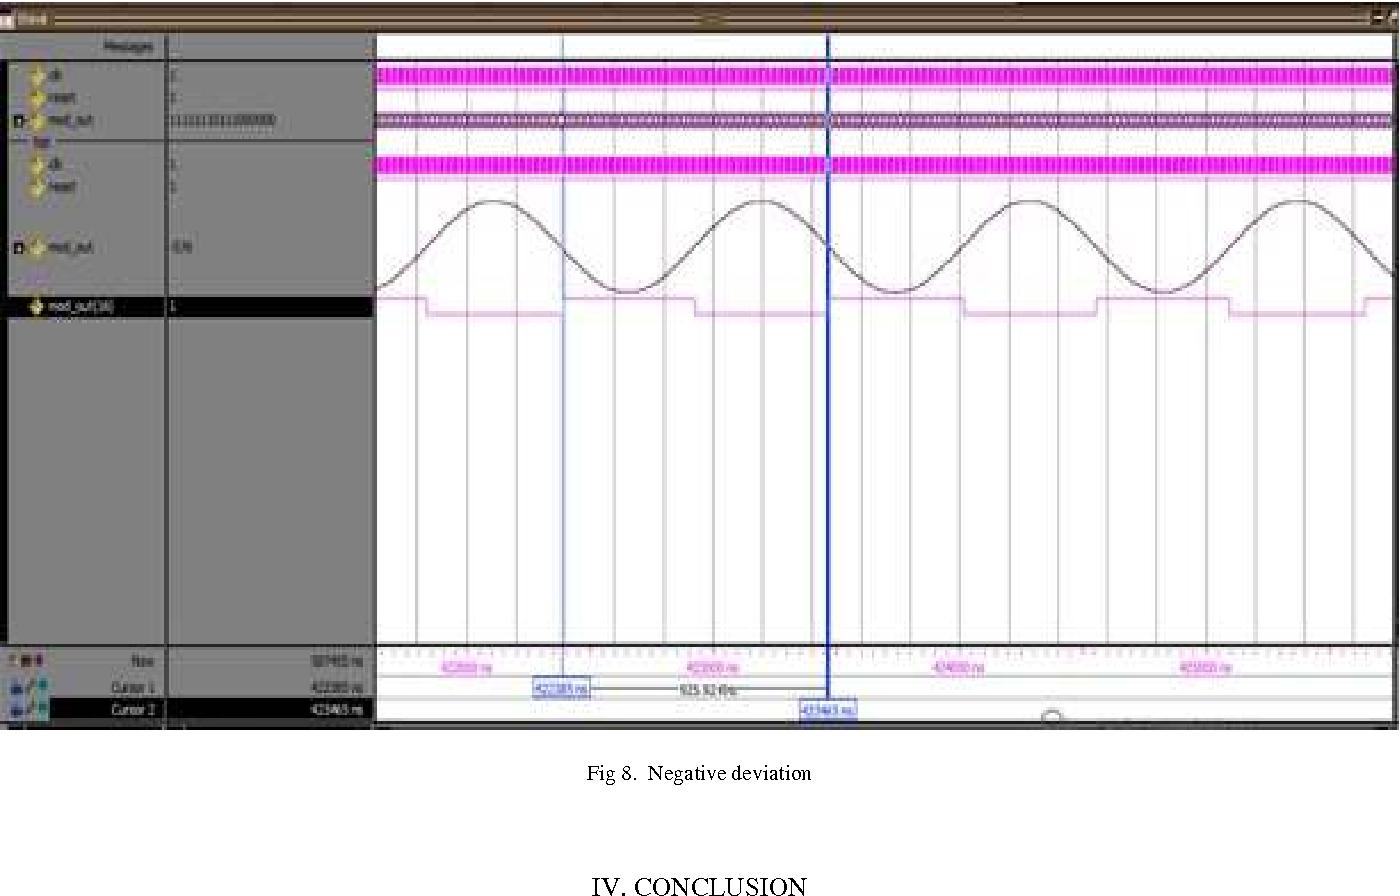 Low Power Fsk Modulation And Demodulation Using Vhdl Semantic Scholar Demodulator